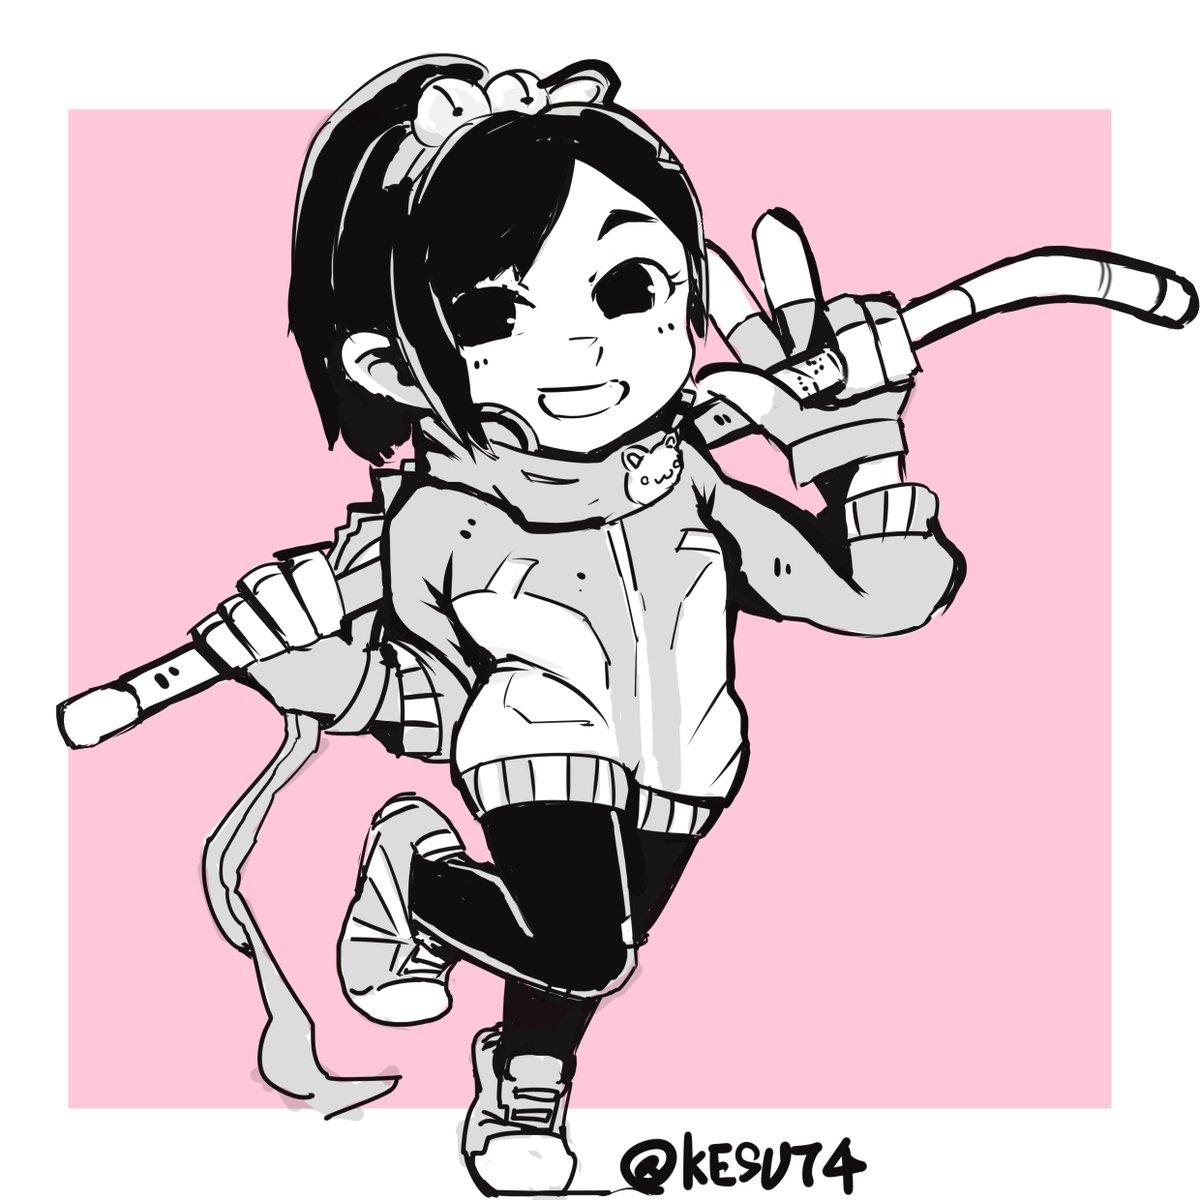 kesuta ケスタ on twitter drawing sanane fexl drawing sanane fexl